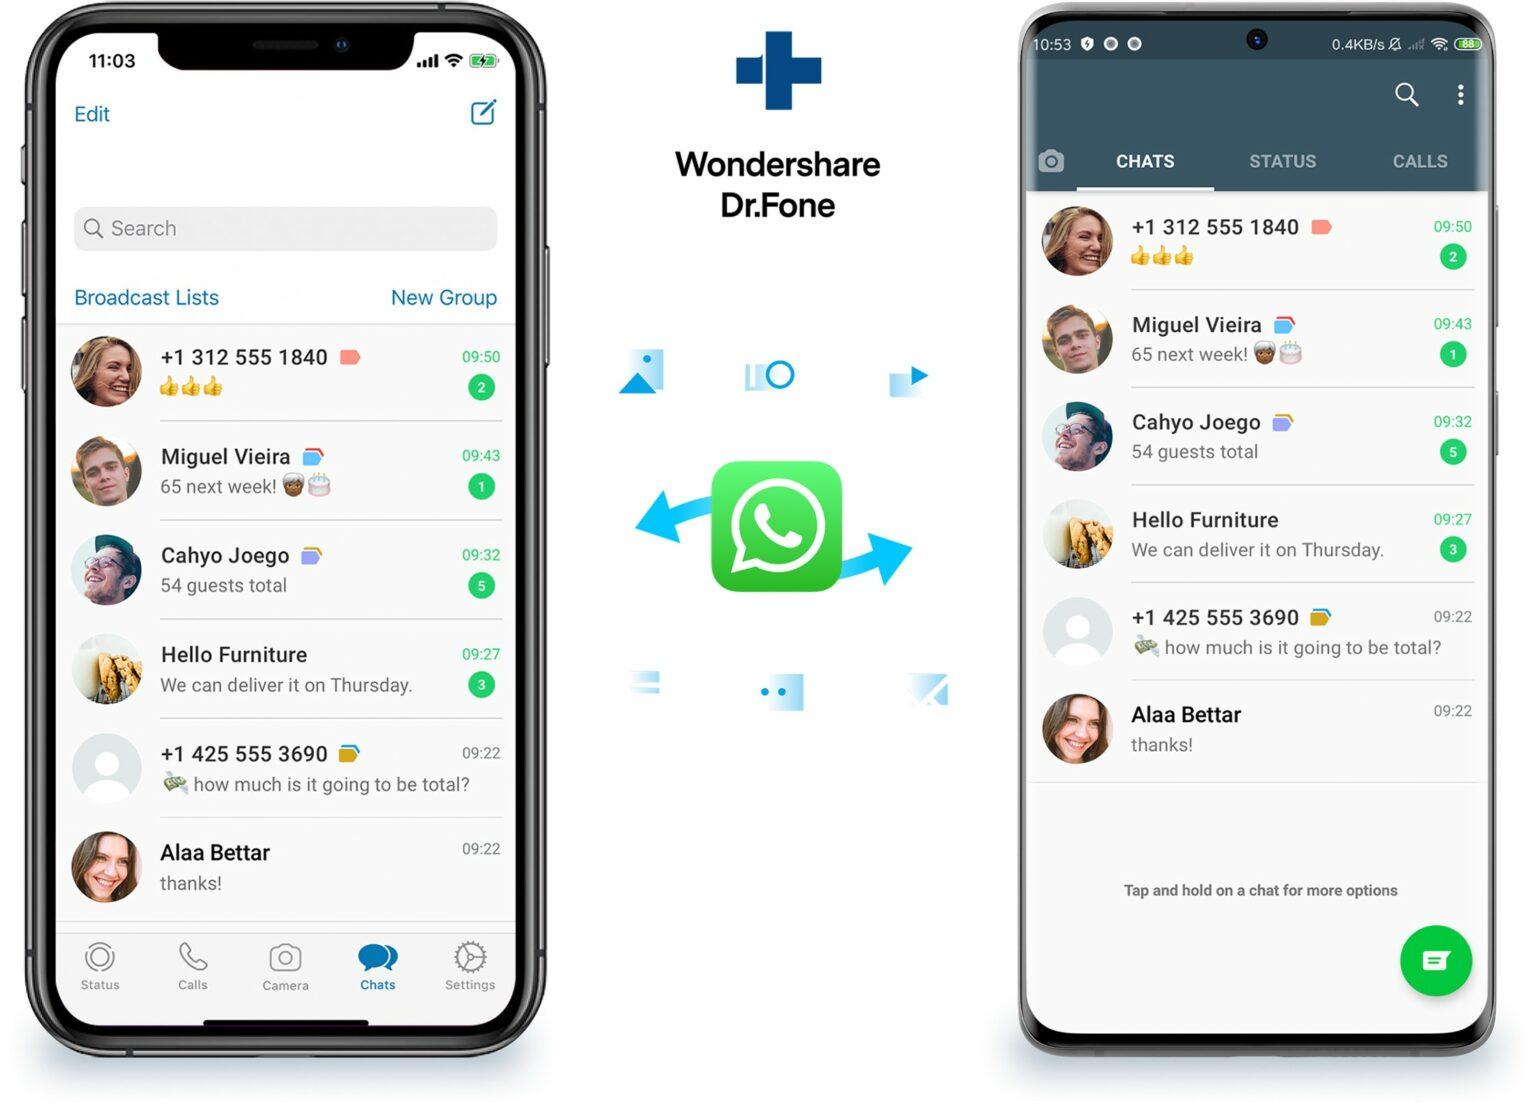 Dr. Fone - WhatsApp Transfer